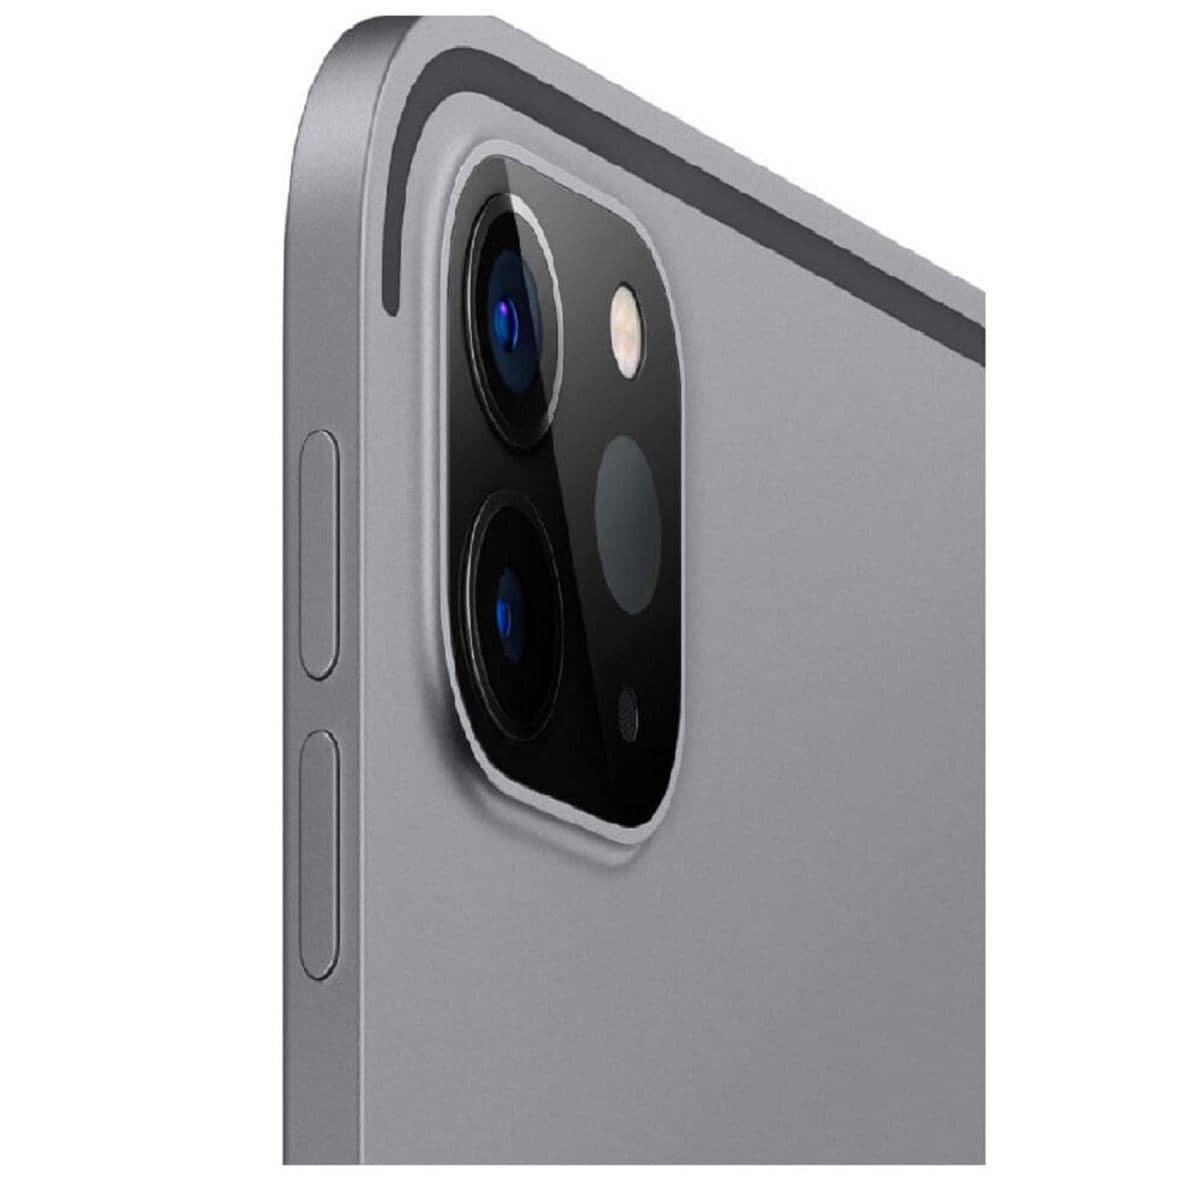 iPad Pro 12.9 256 GB Space Gray-LAE